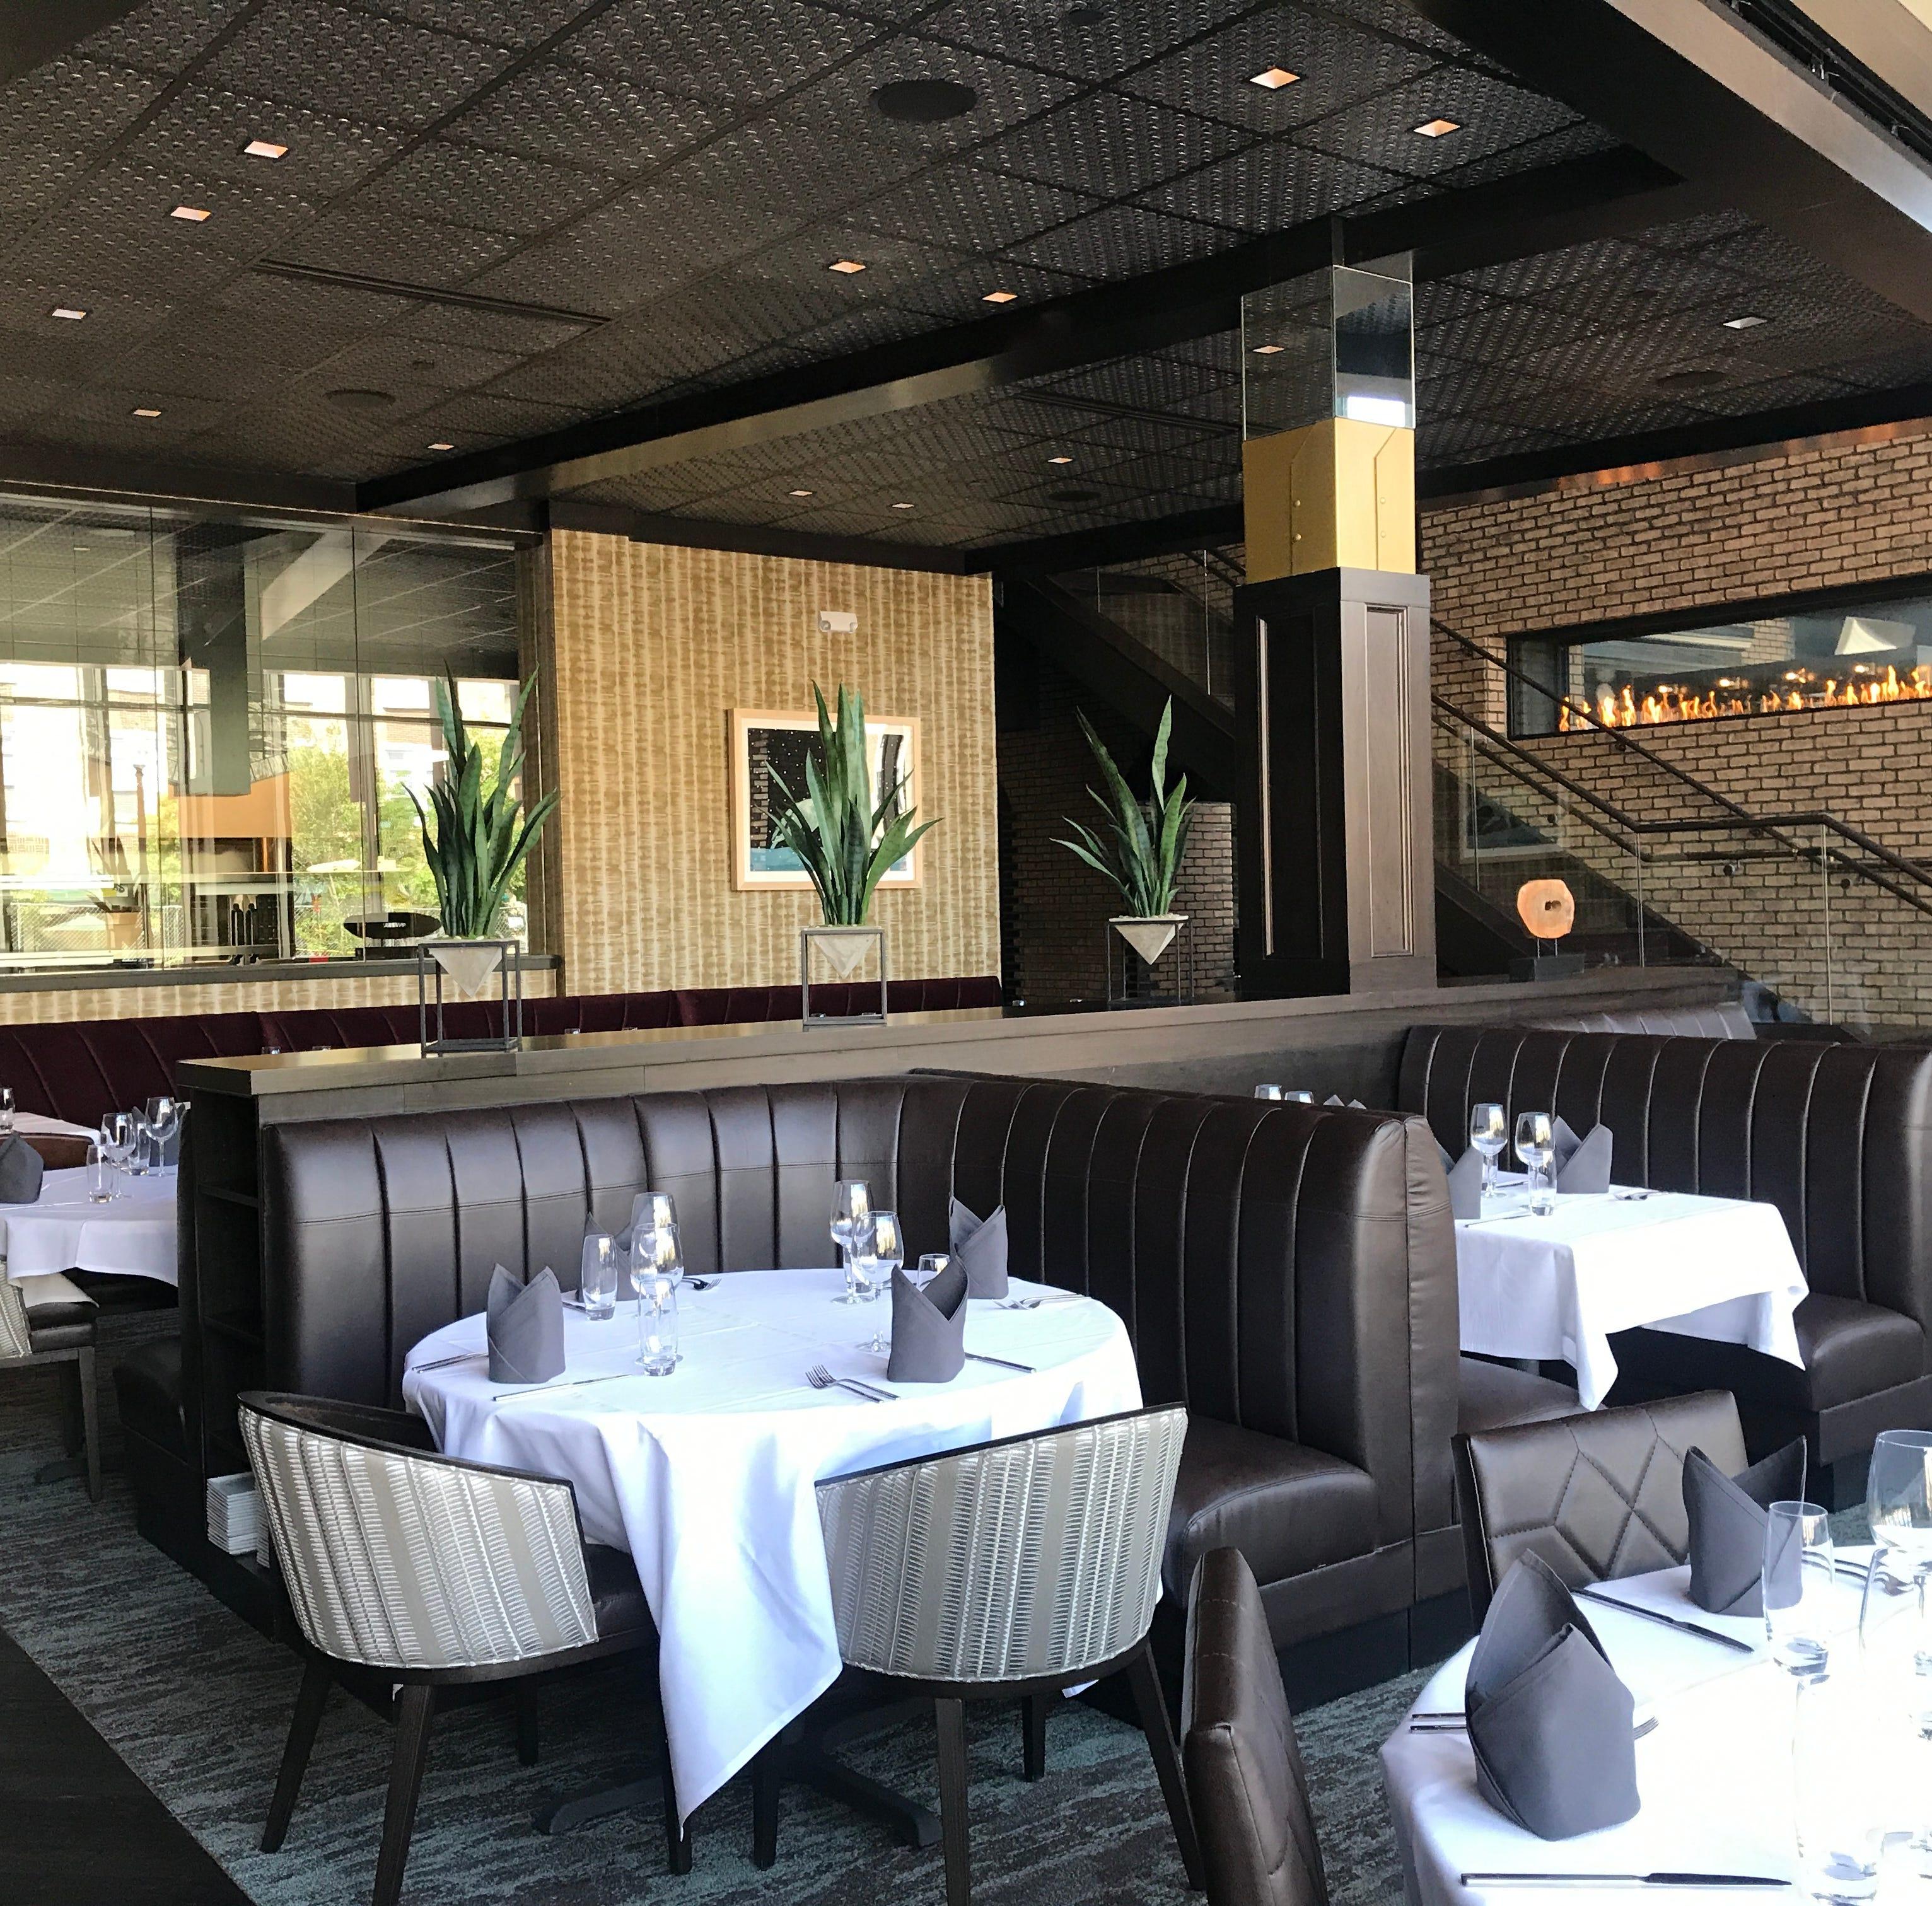 Anthony's Chophouse ends Carmel's 10-year-long, near-dearth of fine dining